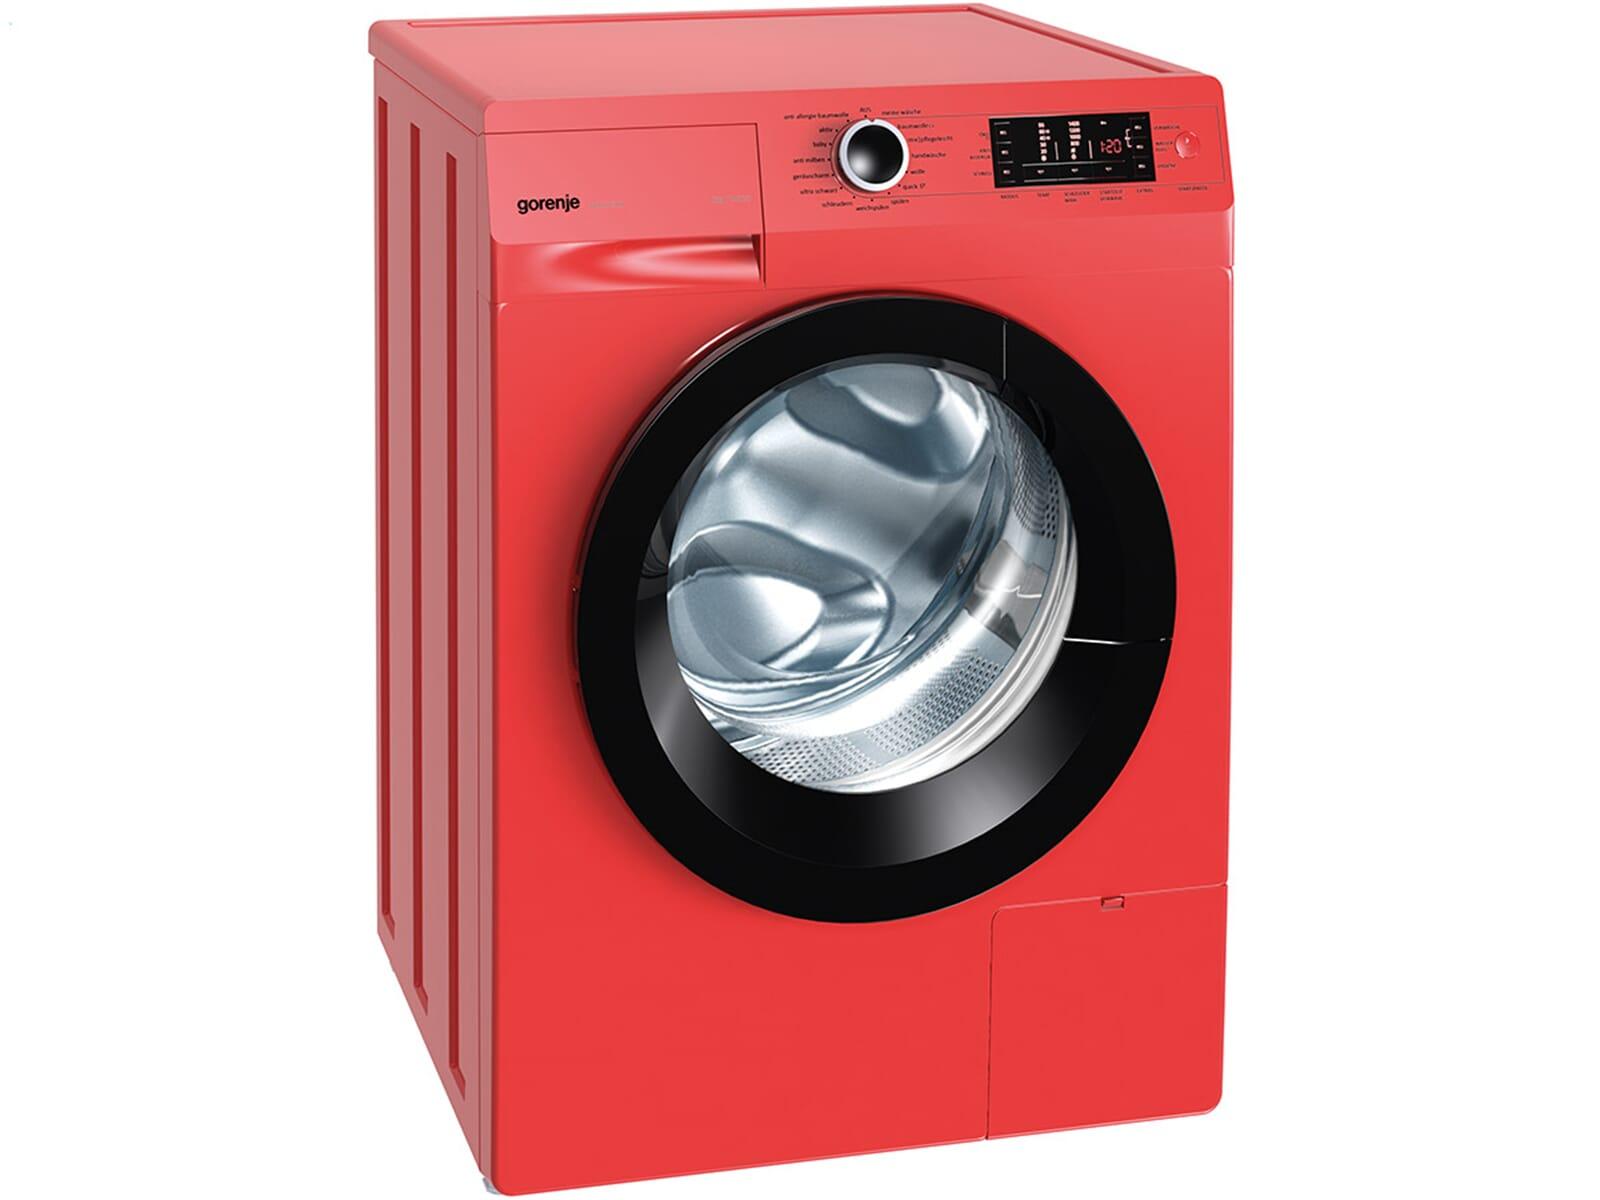 gorenje w 8543 tr stand waschmaschine feuerrot. Black Bedroom Furniture Sets. Home Design Ideas